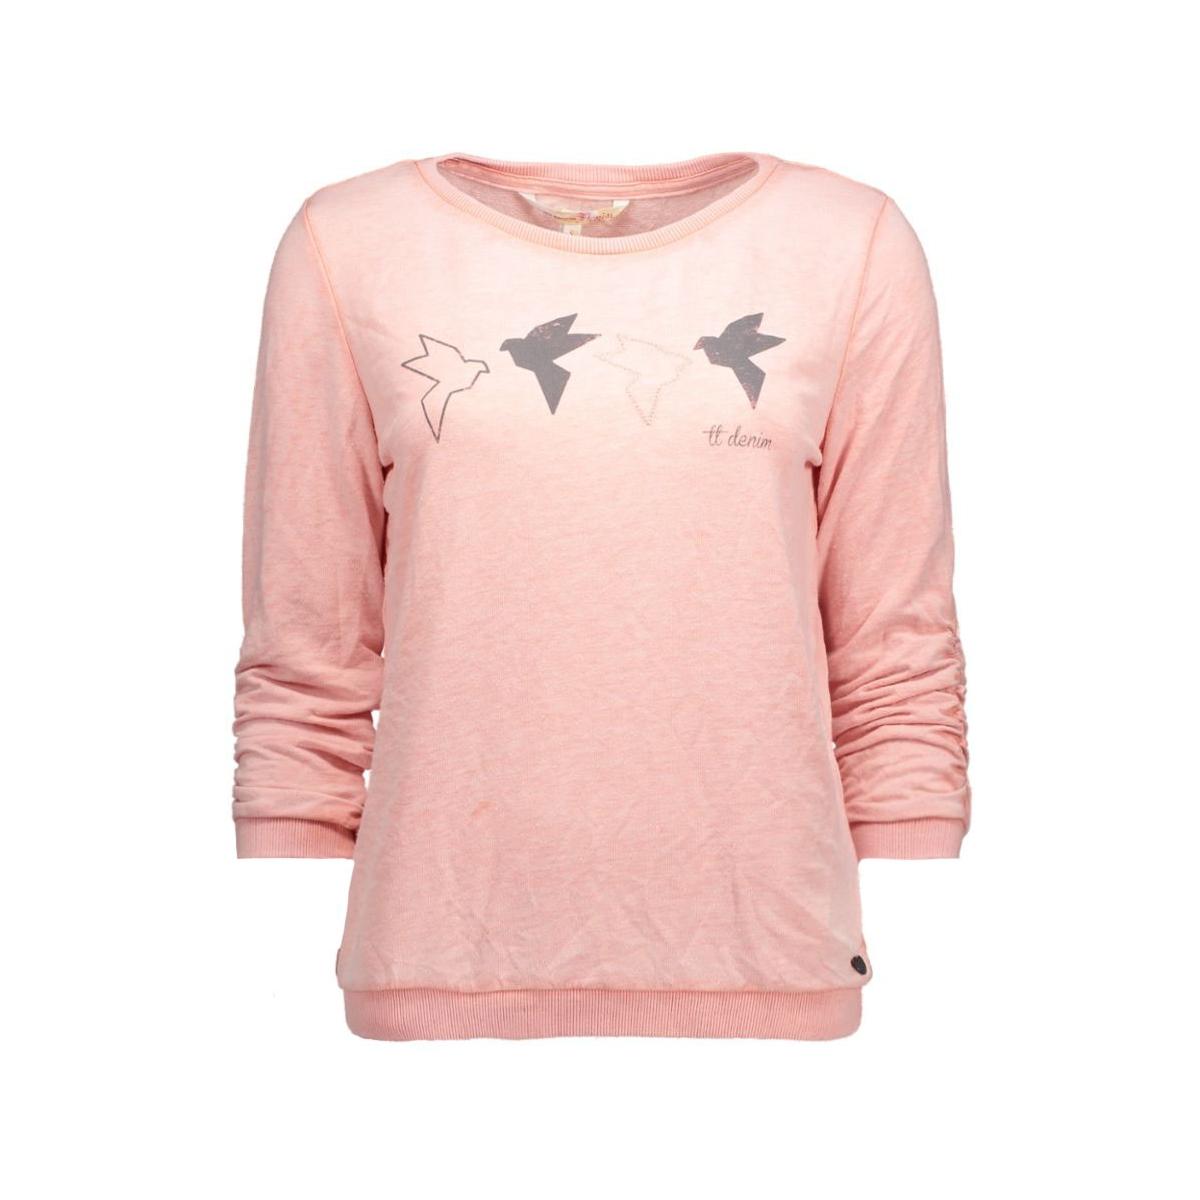 2530418.00.71 tom tailor sweater 4728